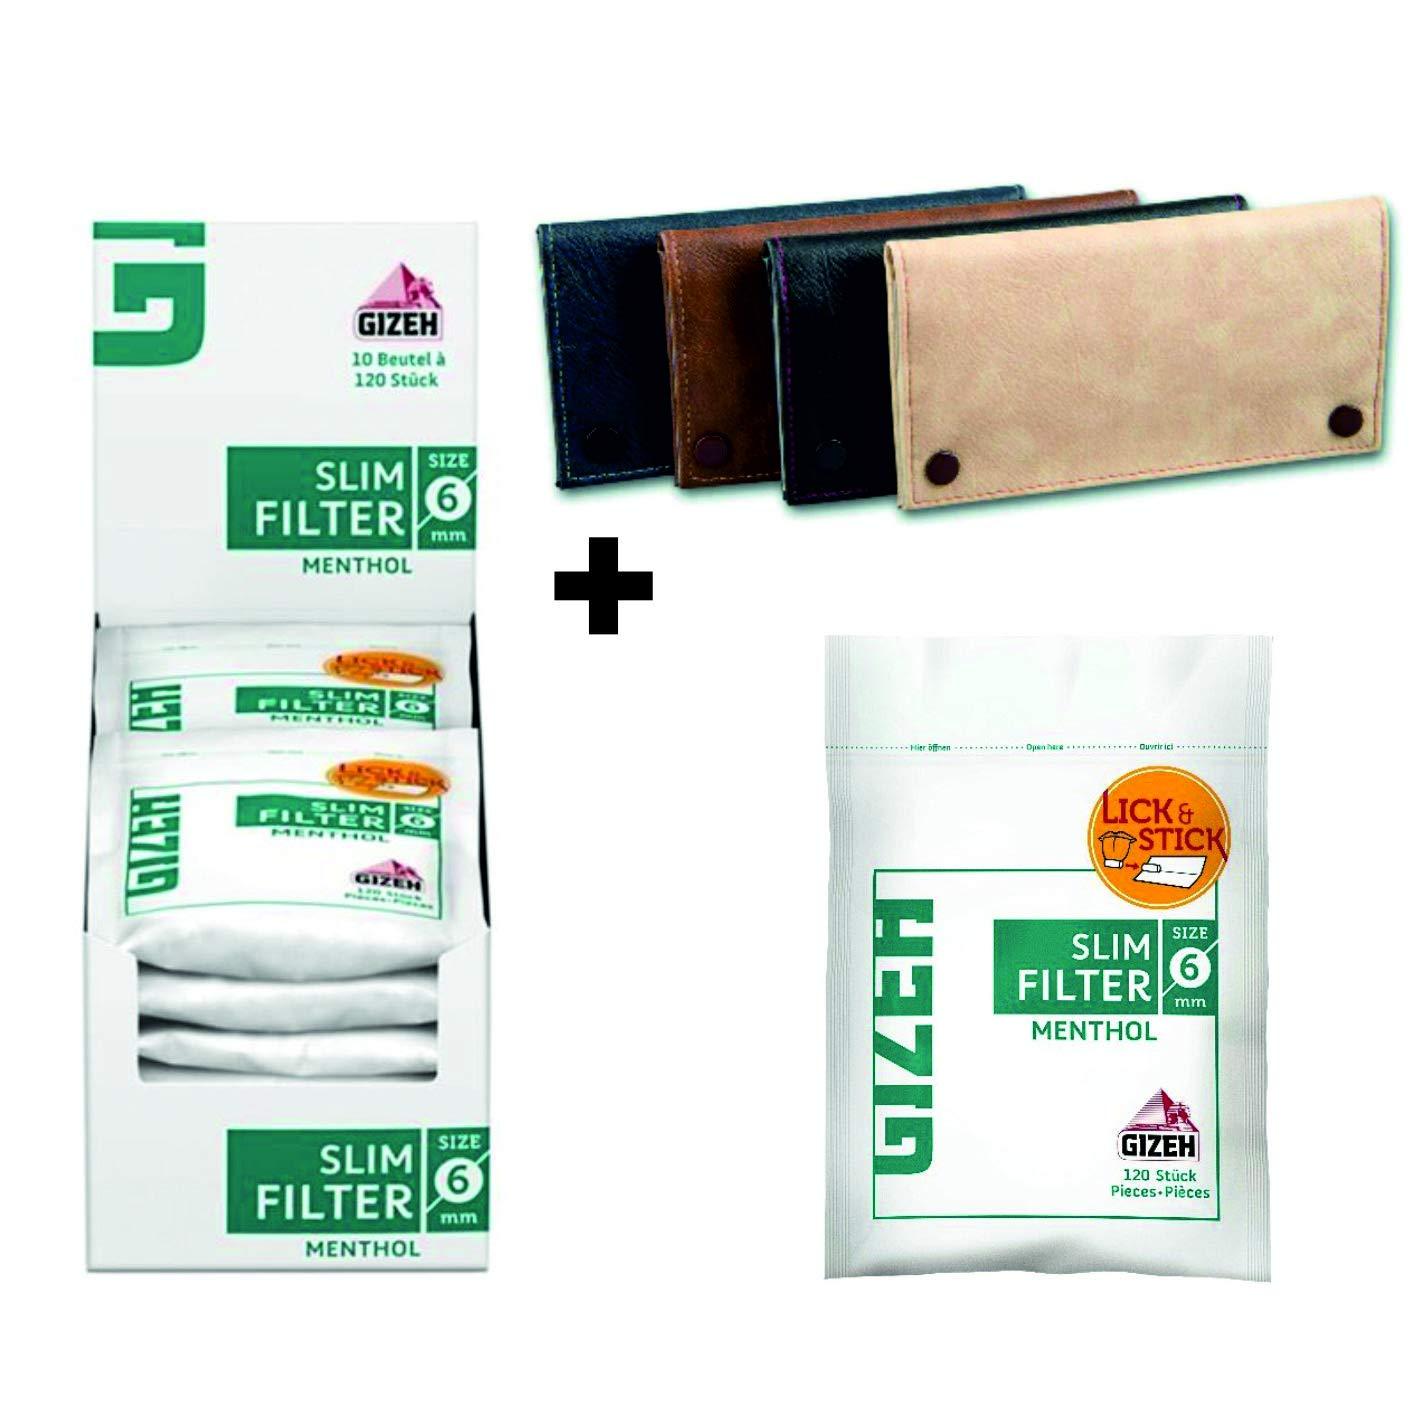 10 x 120 Dark Horse MENTHOL Drehfilter 6 mm Slim filter Finefilter Eindrehfilter